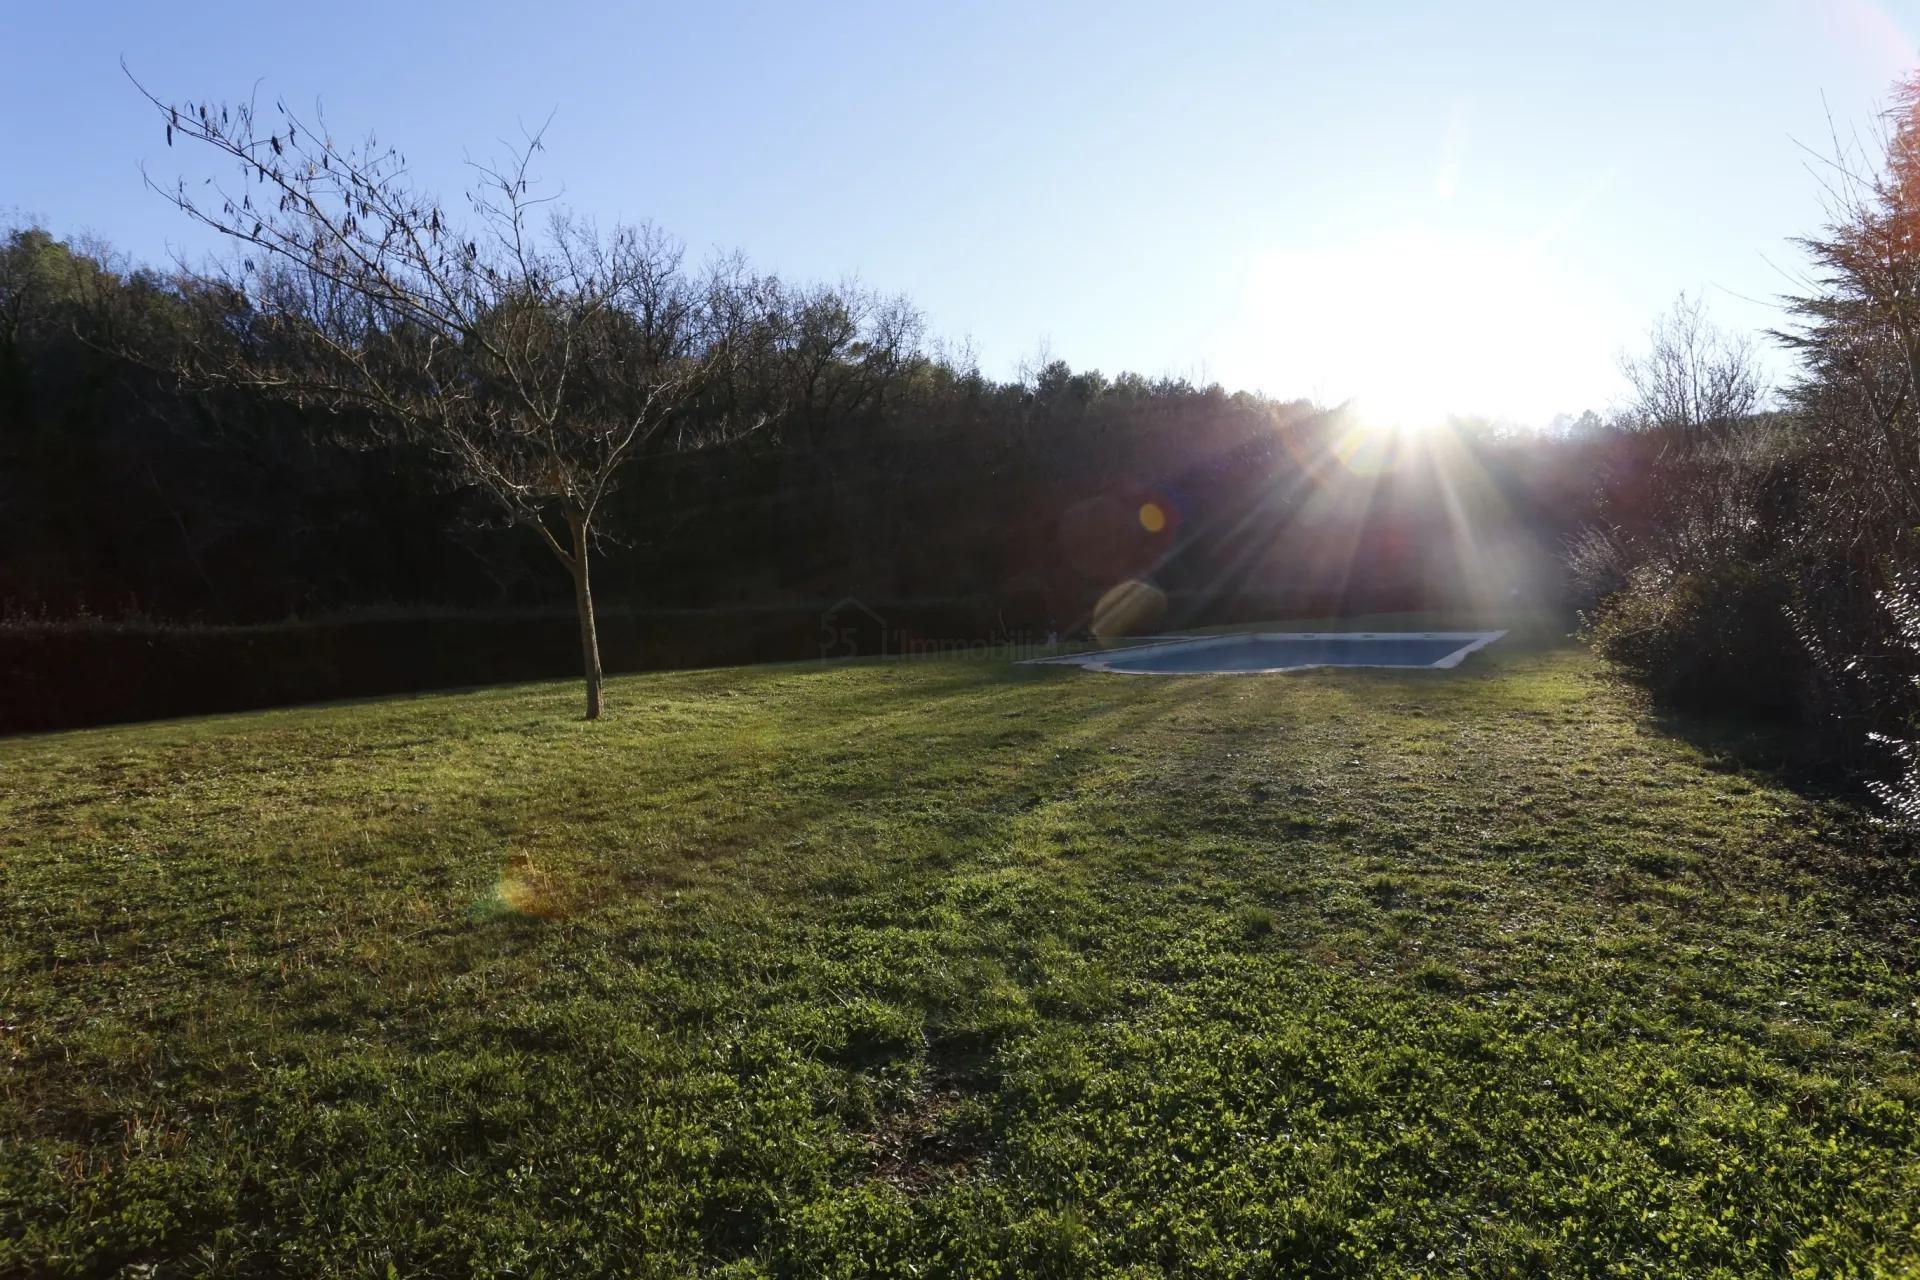 BASTIDON PROVENÇALE - 4 Pièces, Jardin, Piscines, Tennis, Golf